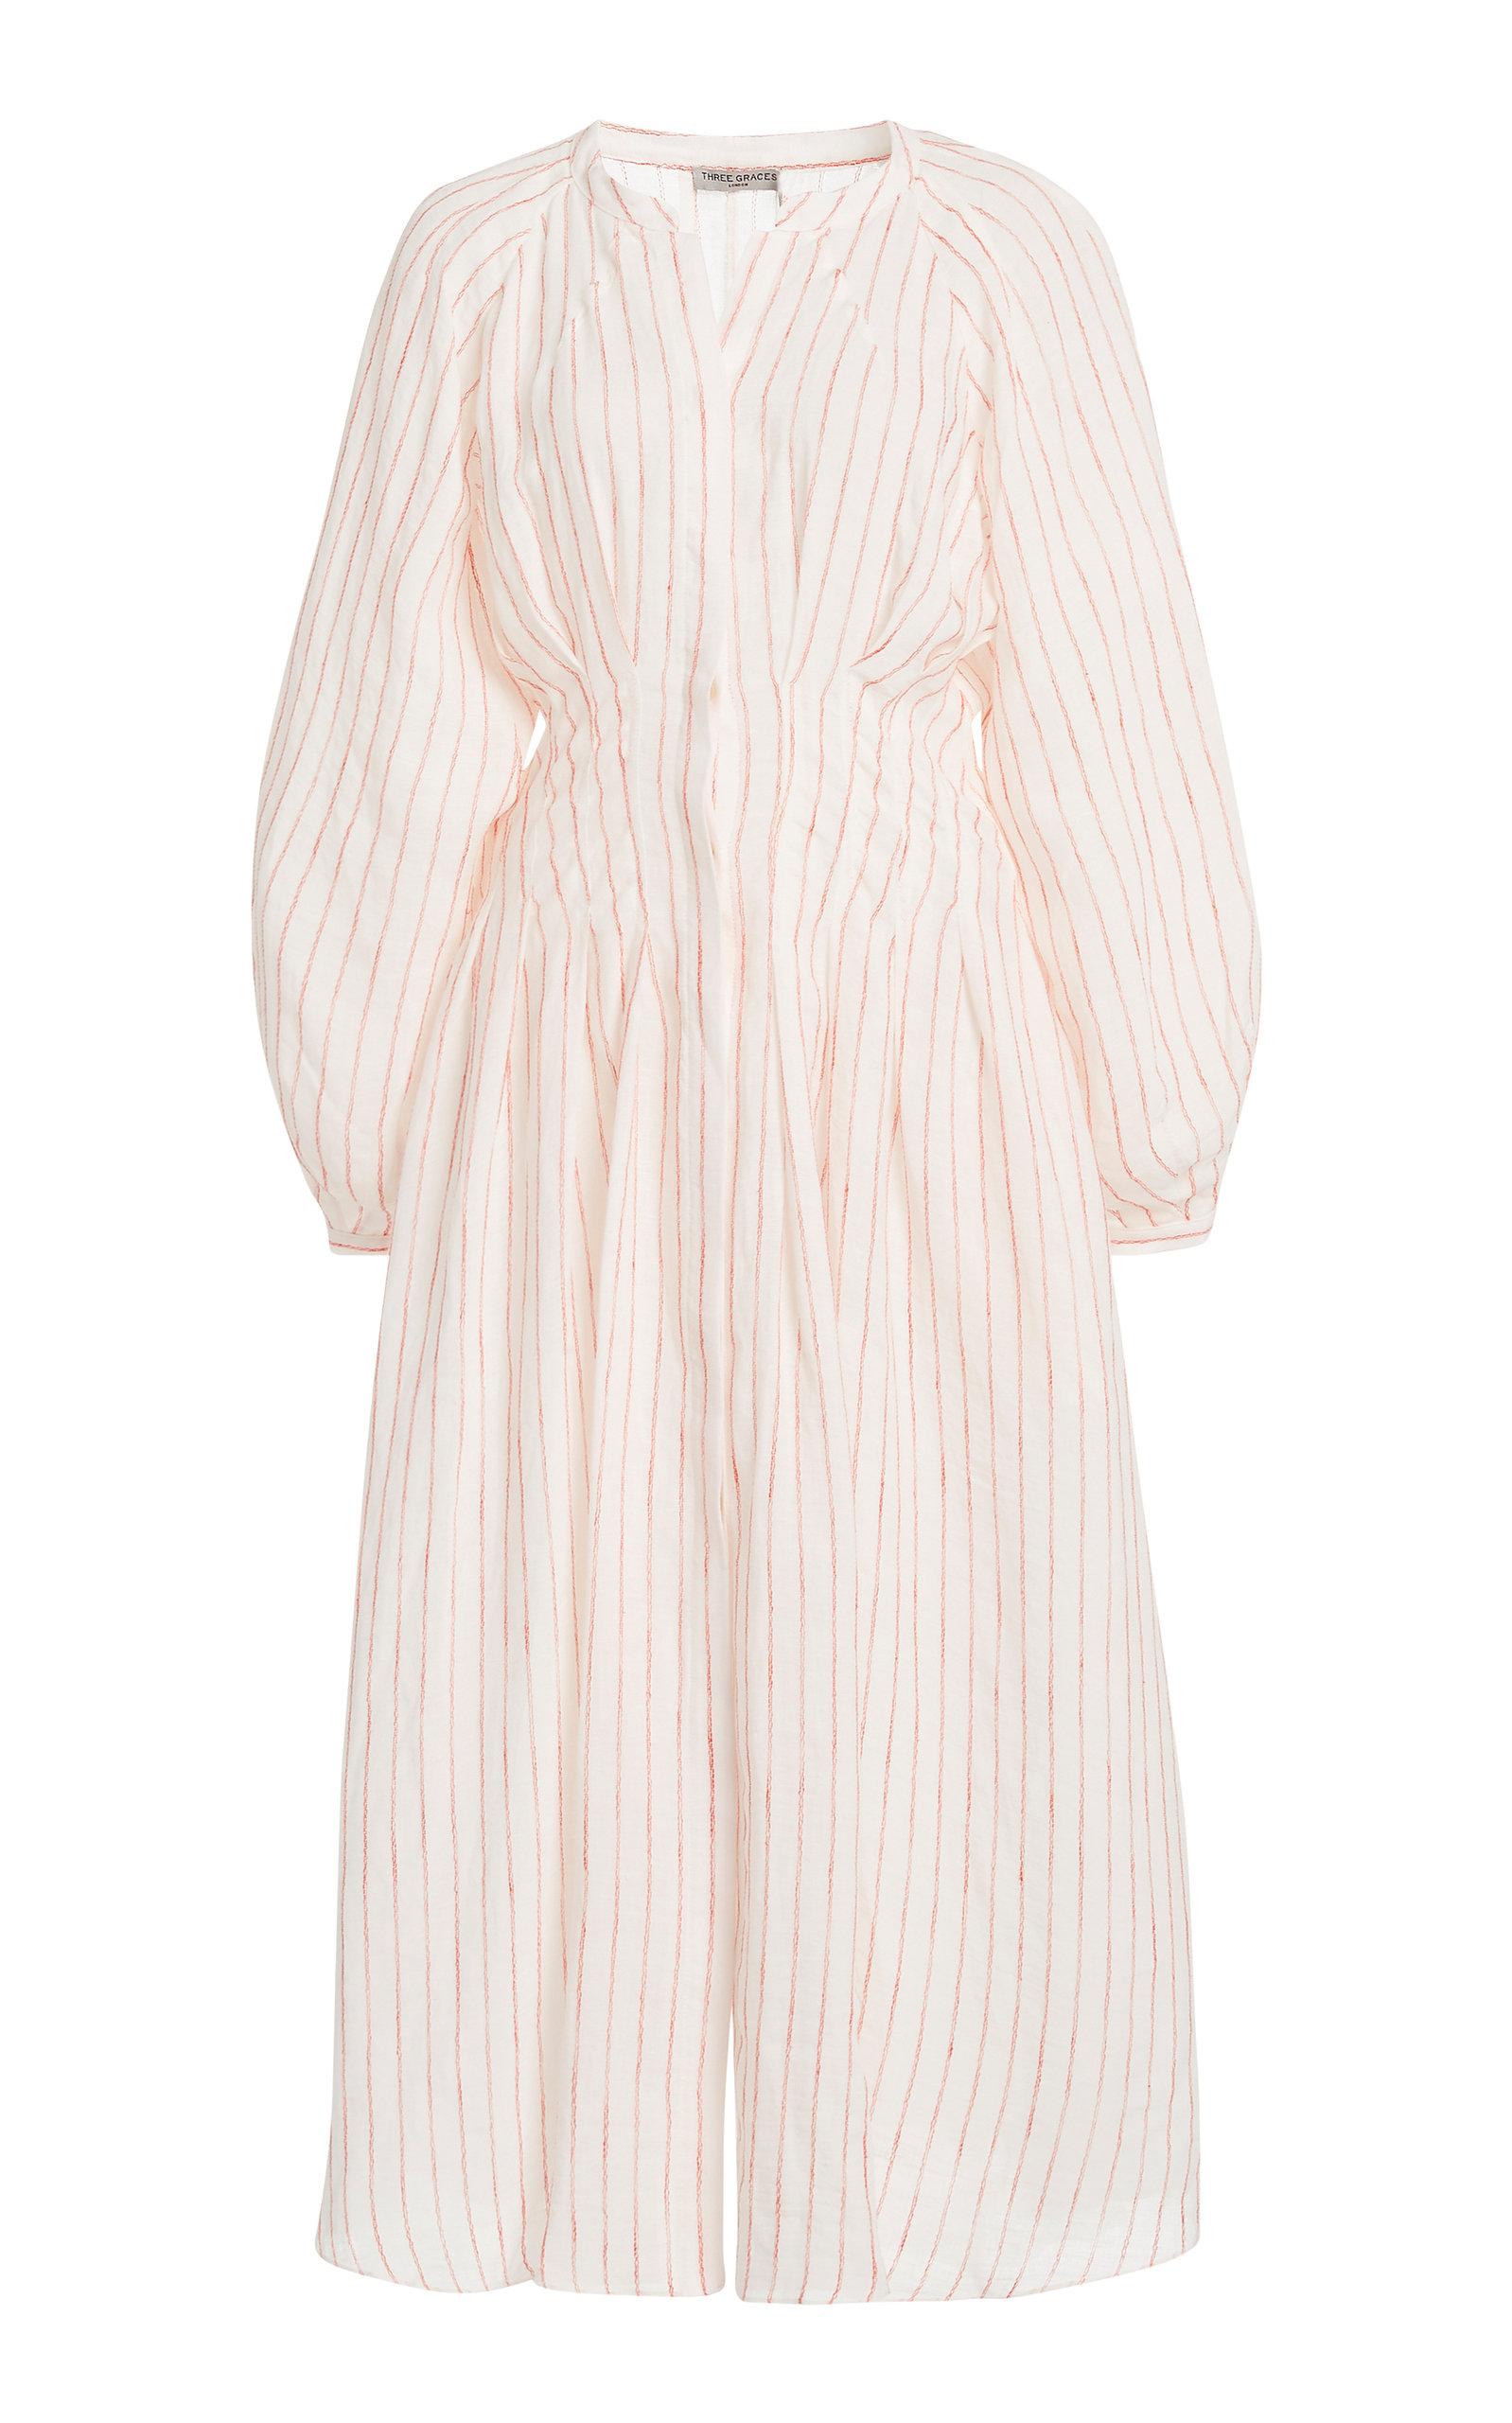 Buy Three Graces London Valeraine Striped Linen Midi Dress online, shop Three Graces London at the best price